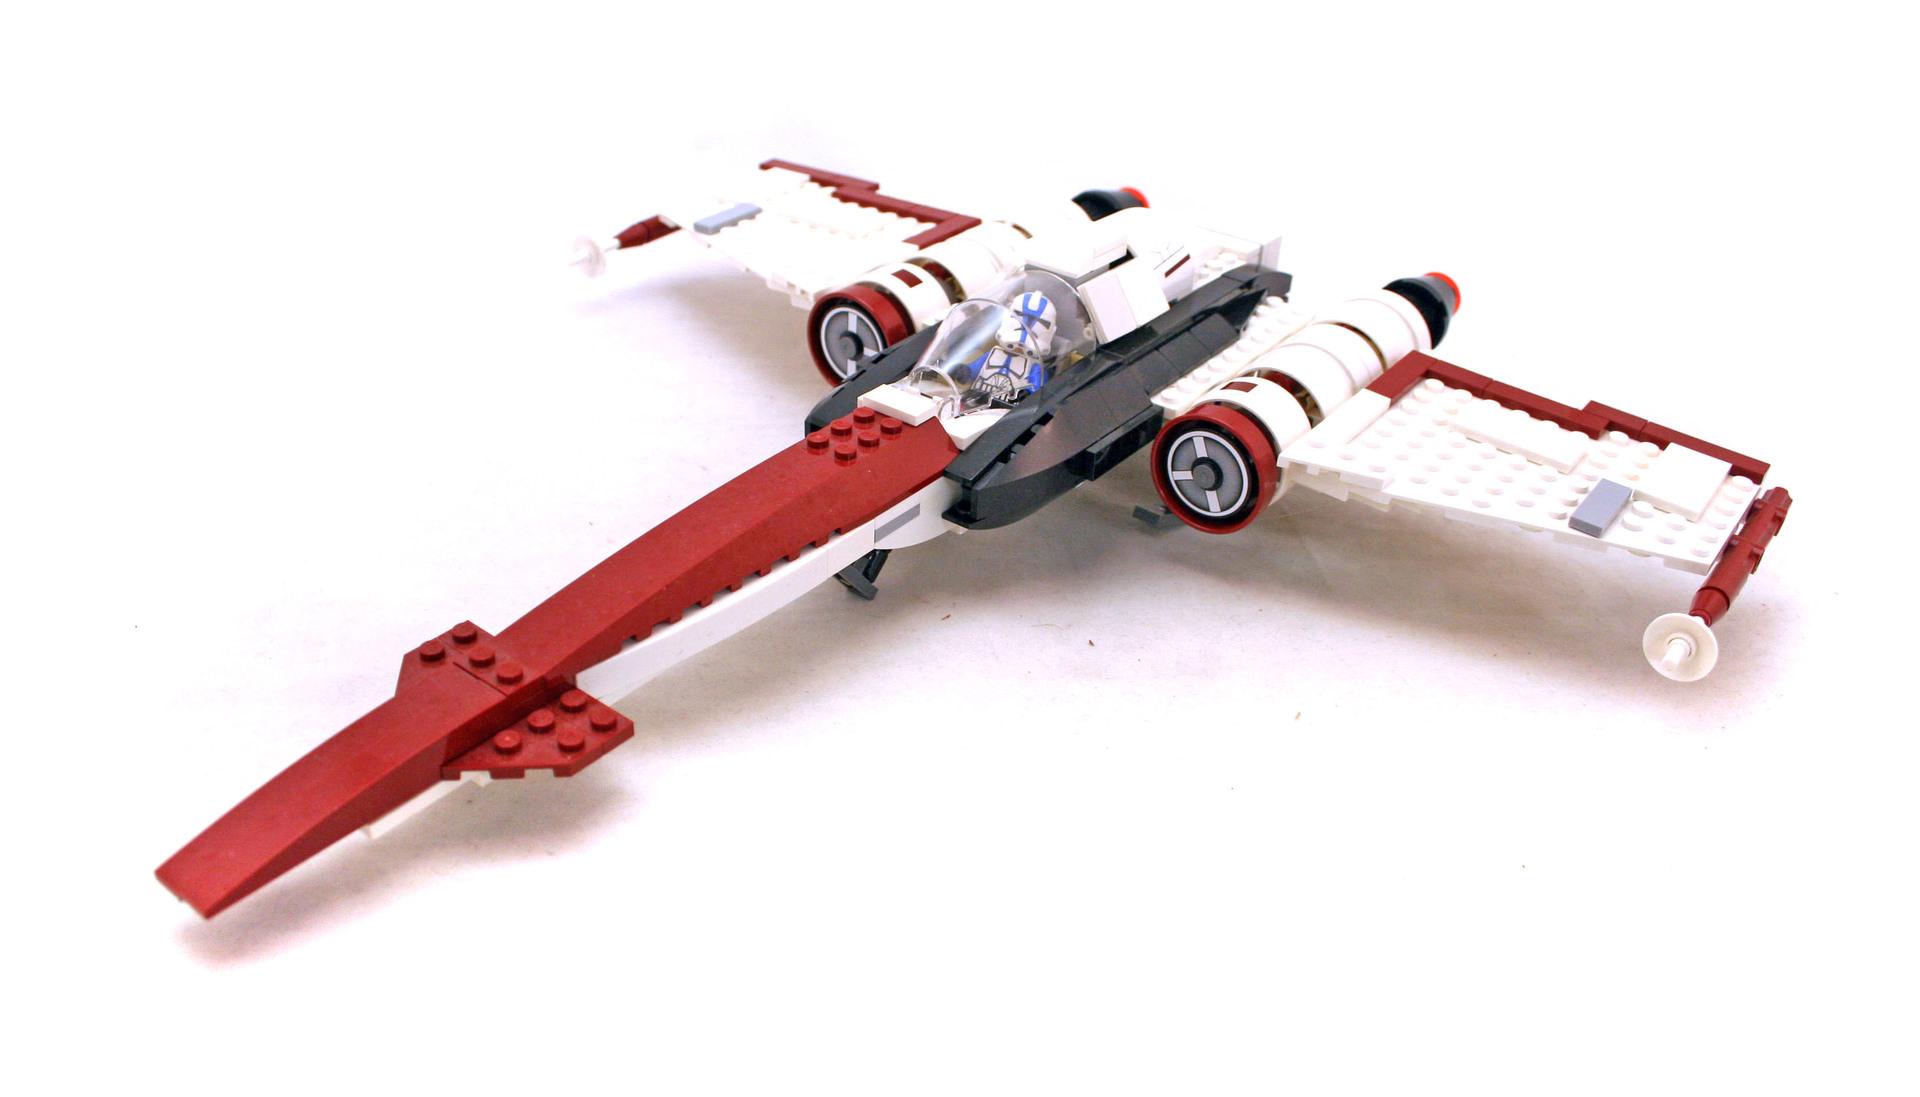 Z 95 Headhunter Lego Set 75004 1 Building Sets Star Wars The